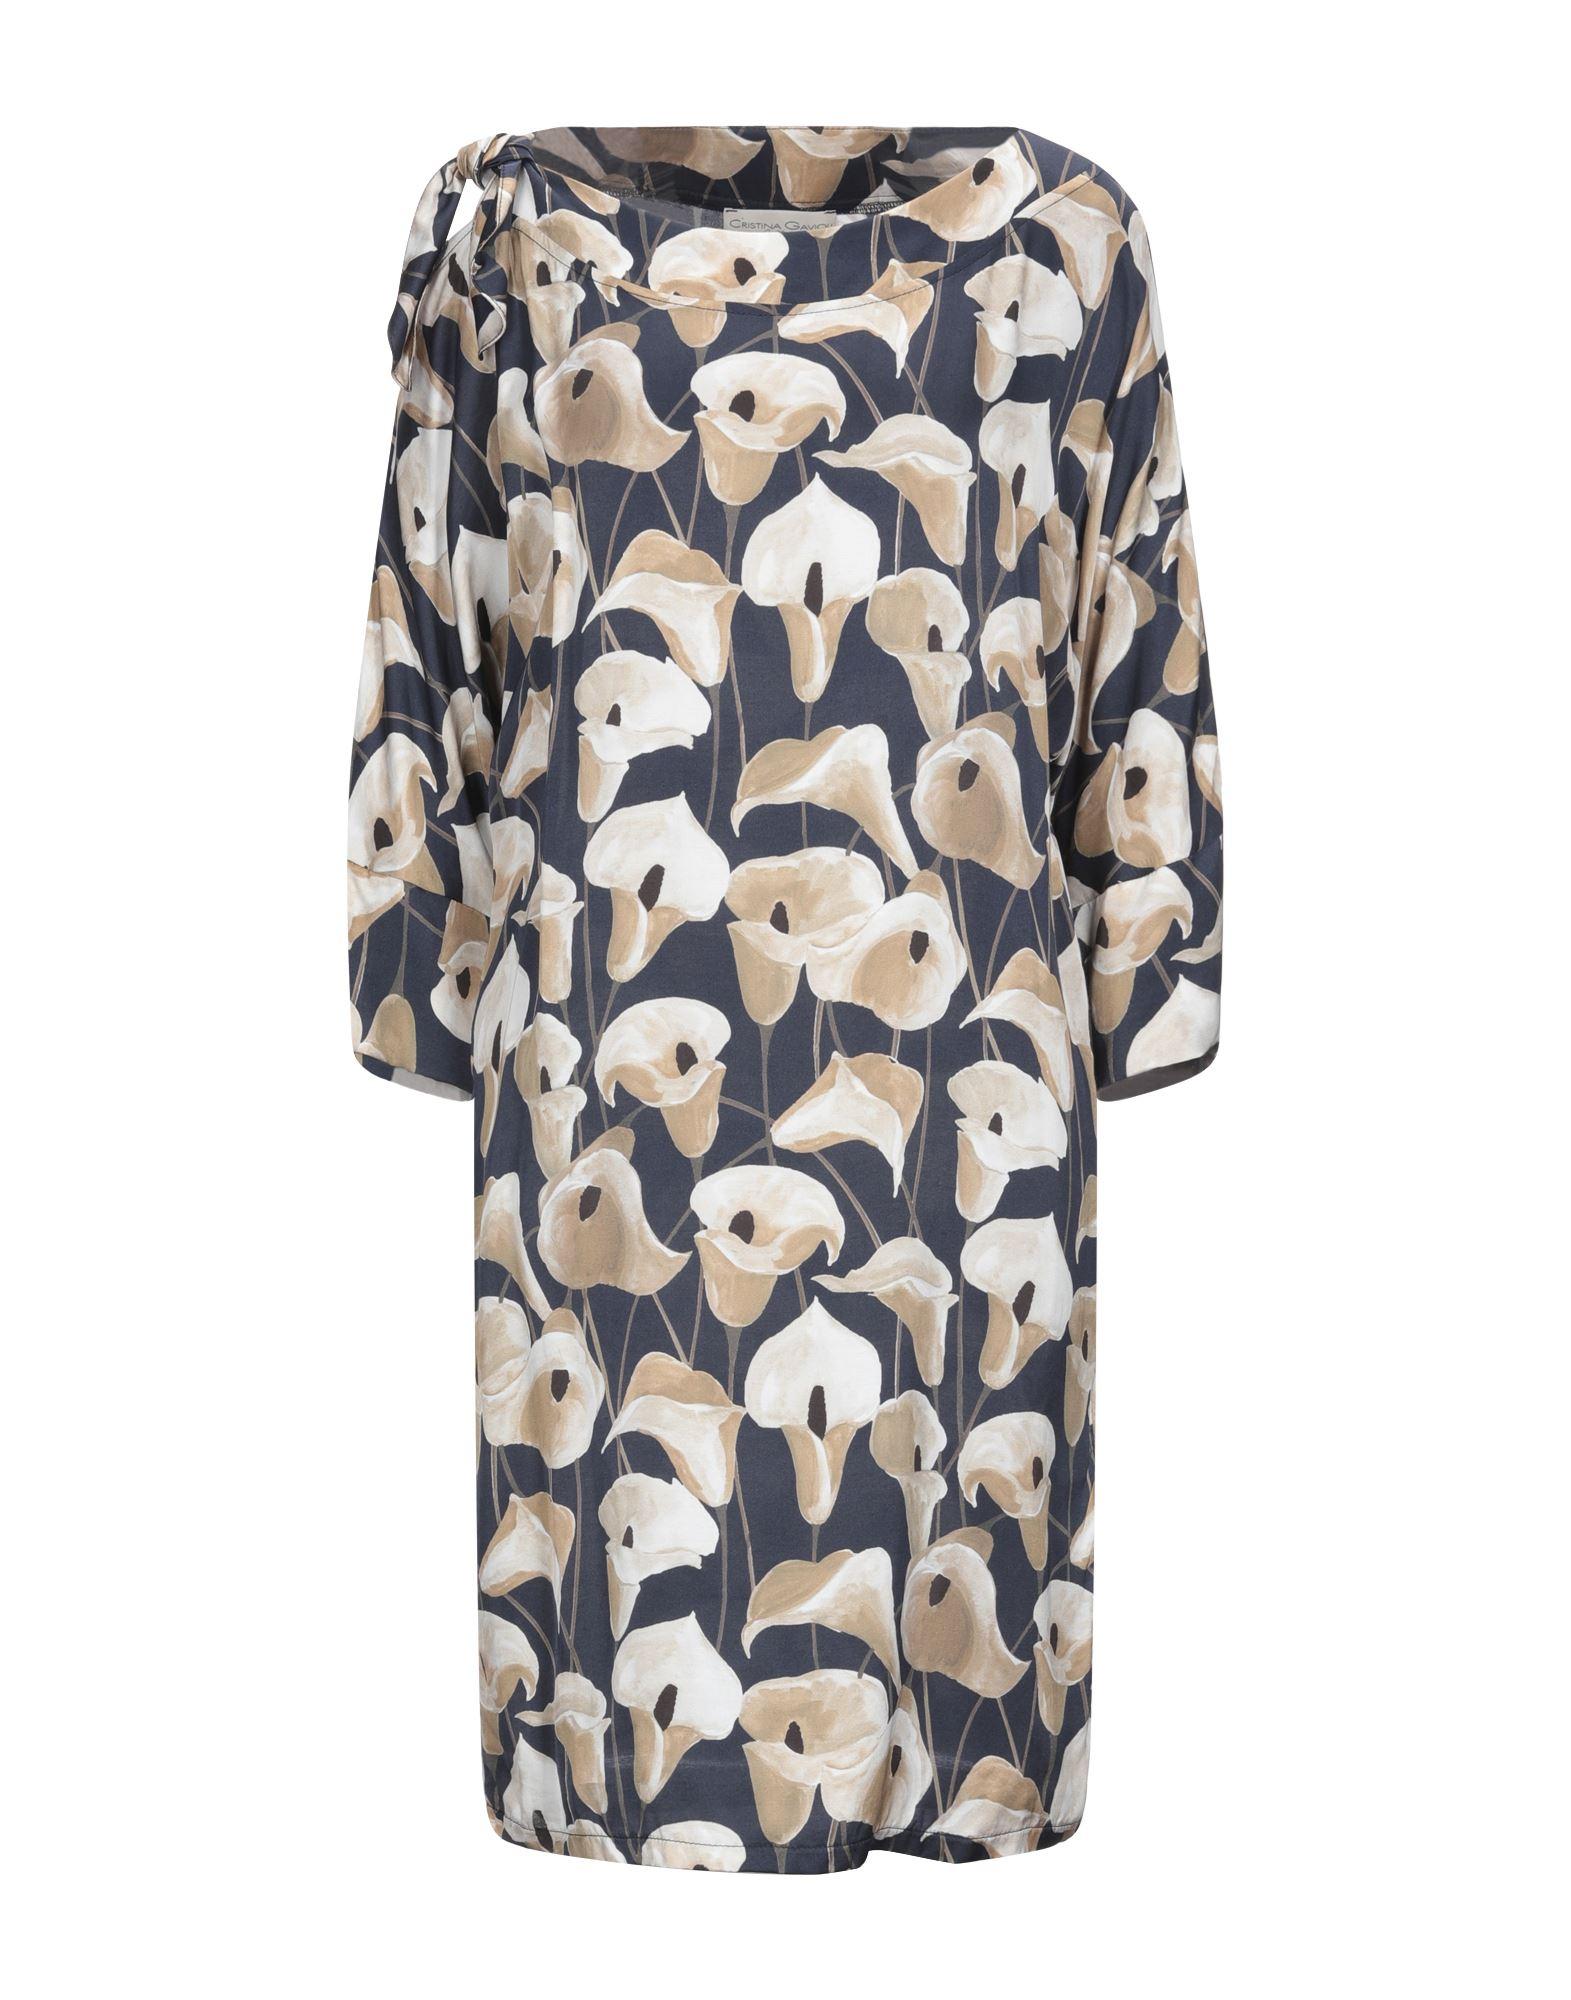 CRISTINA GAVIOLI COLLECTION Короткое платье фото